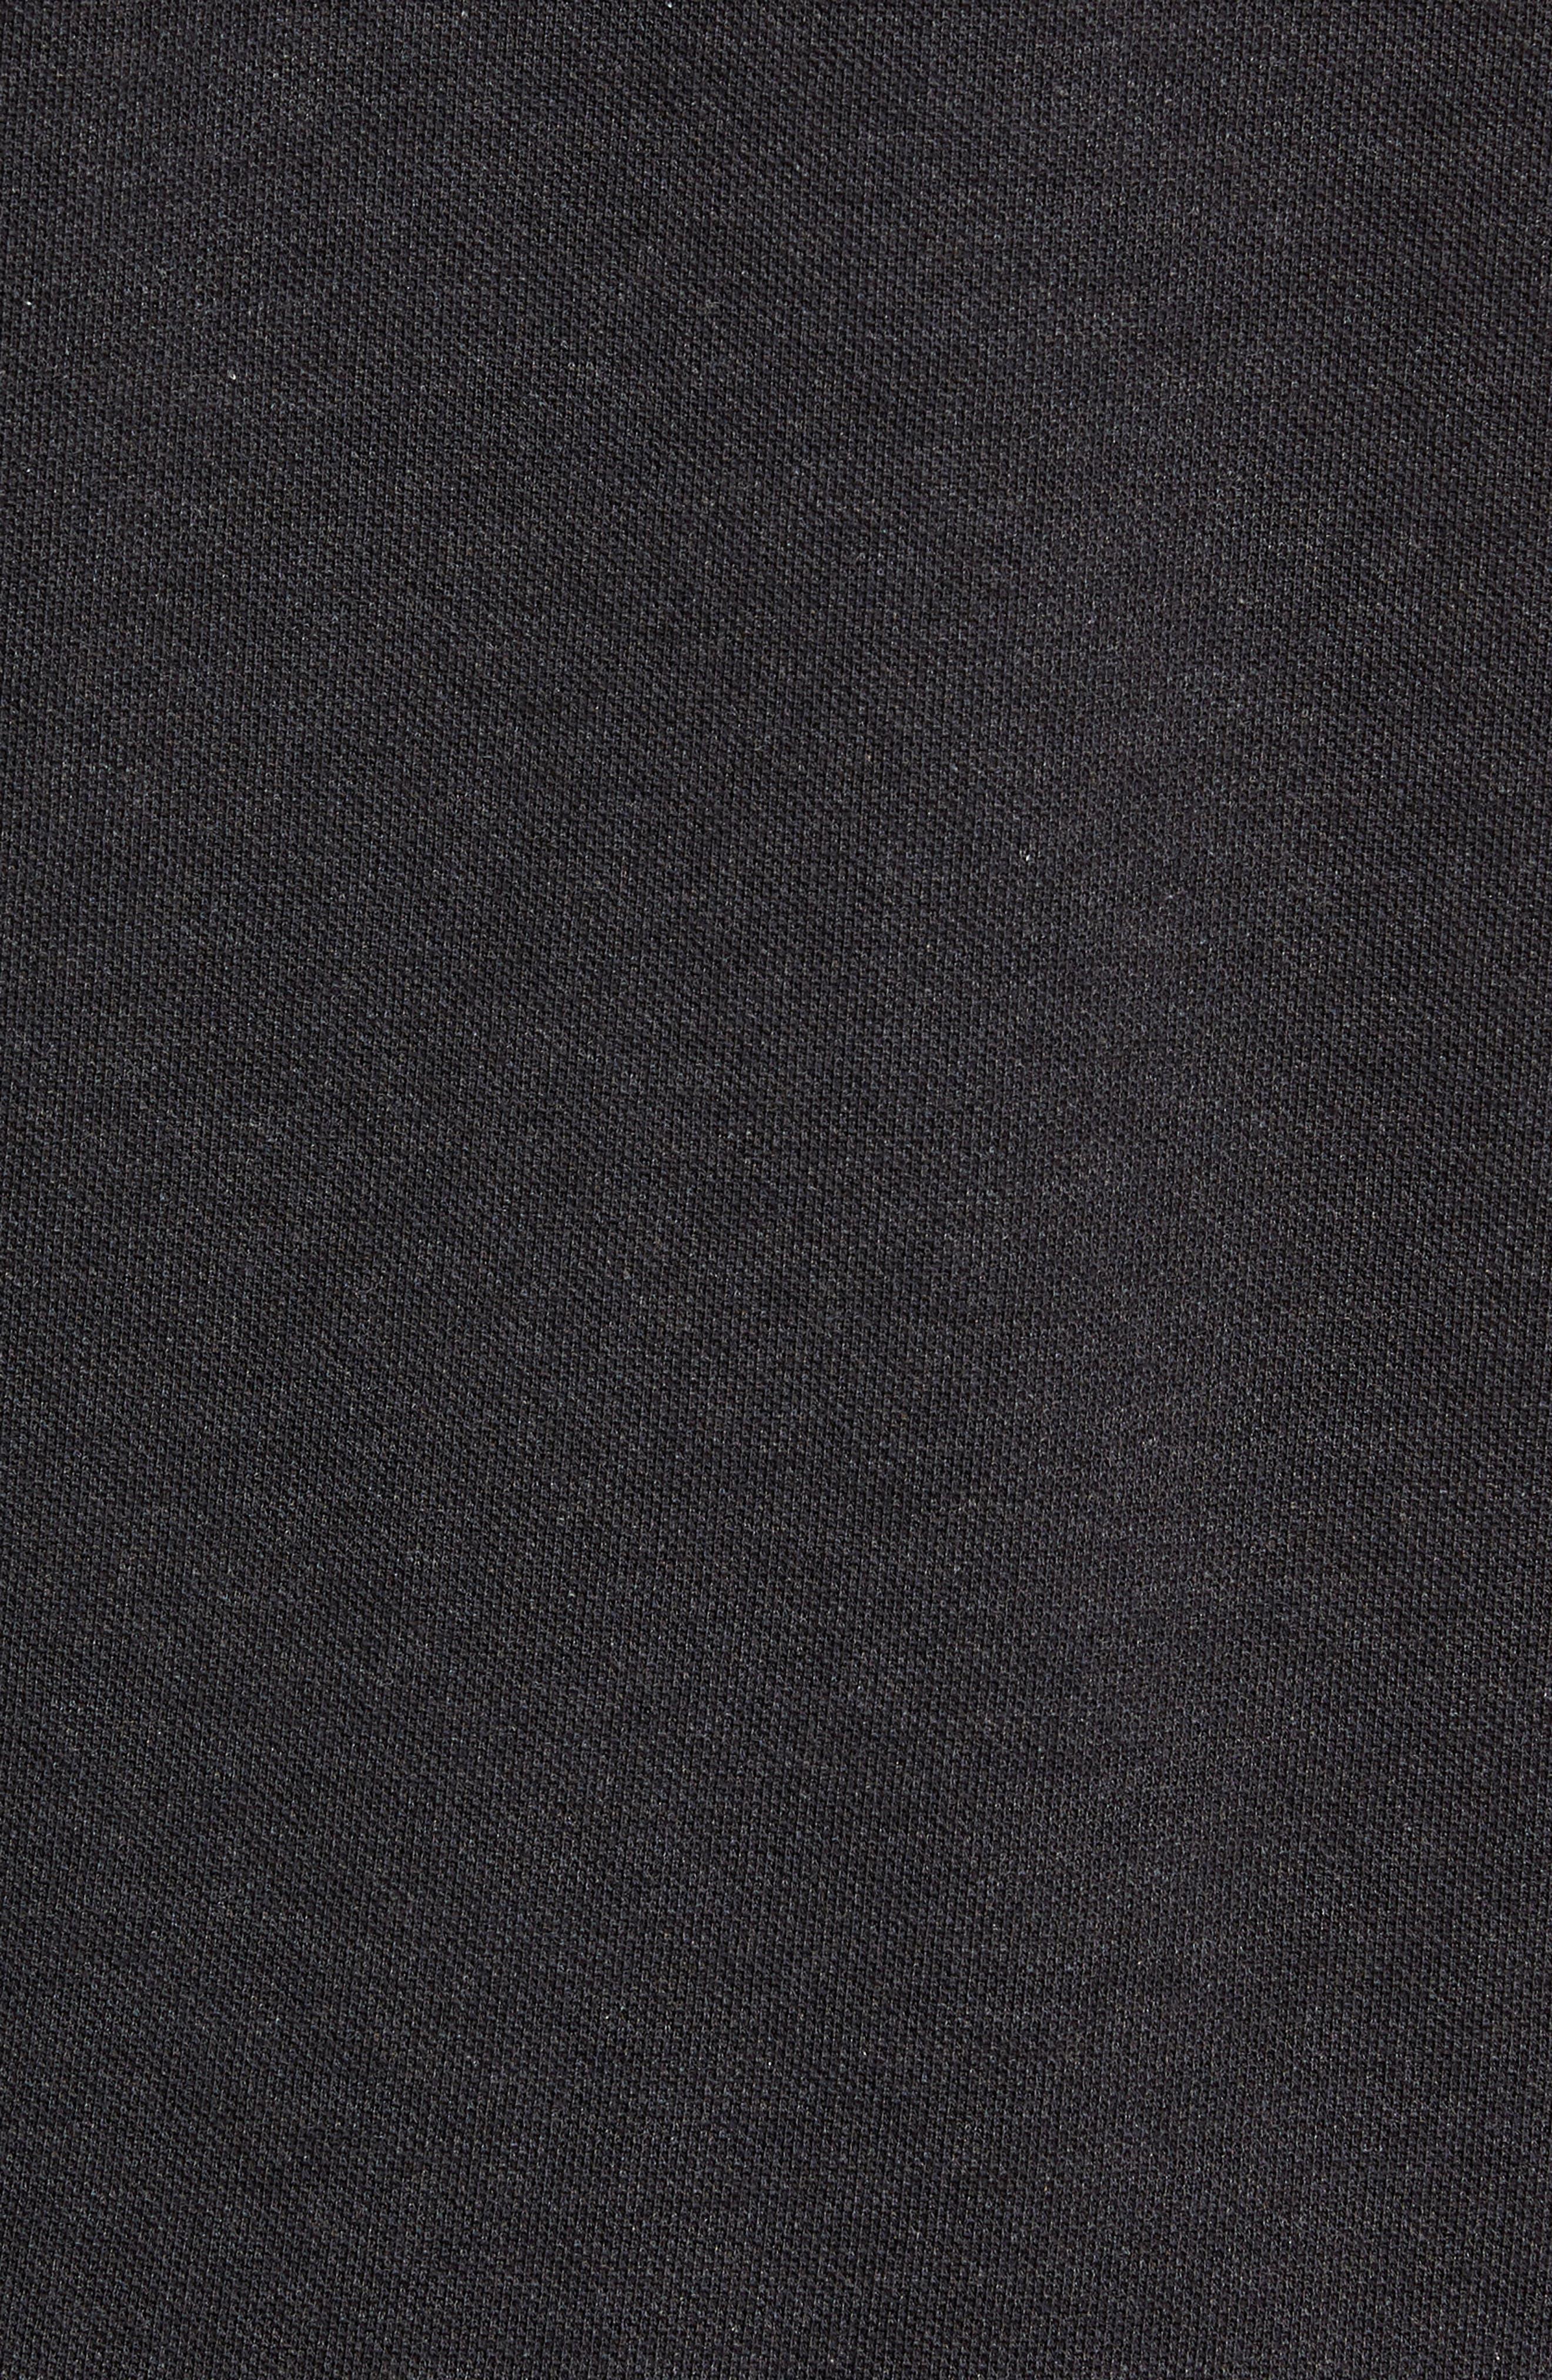 Long Sleeve Piqué Polo,                             Alternate thumbnail 5, color,                             LIGHTNING CHINE